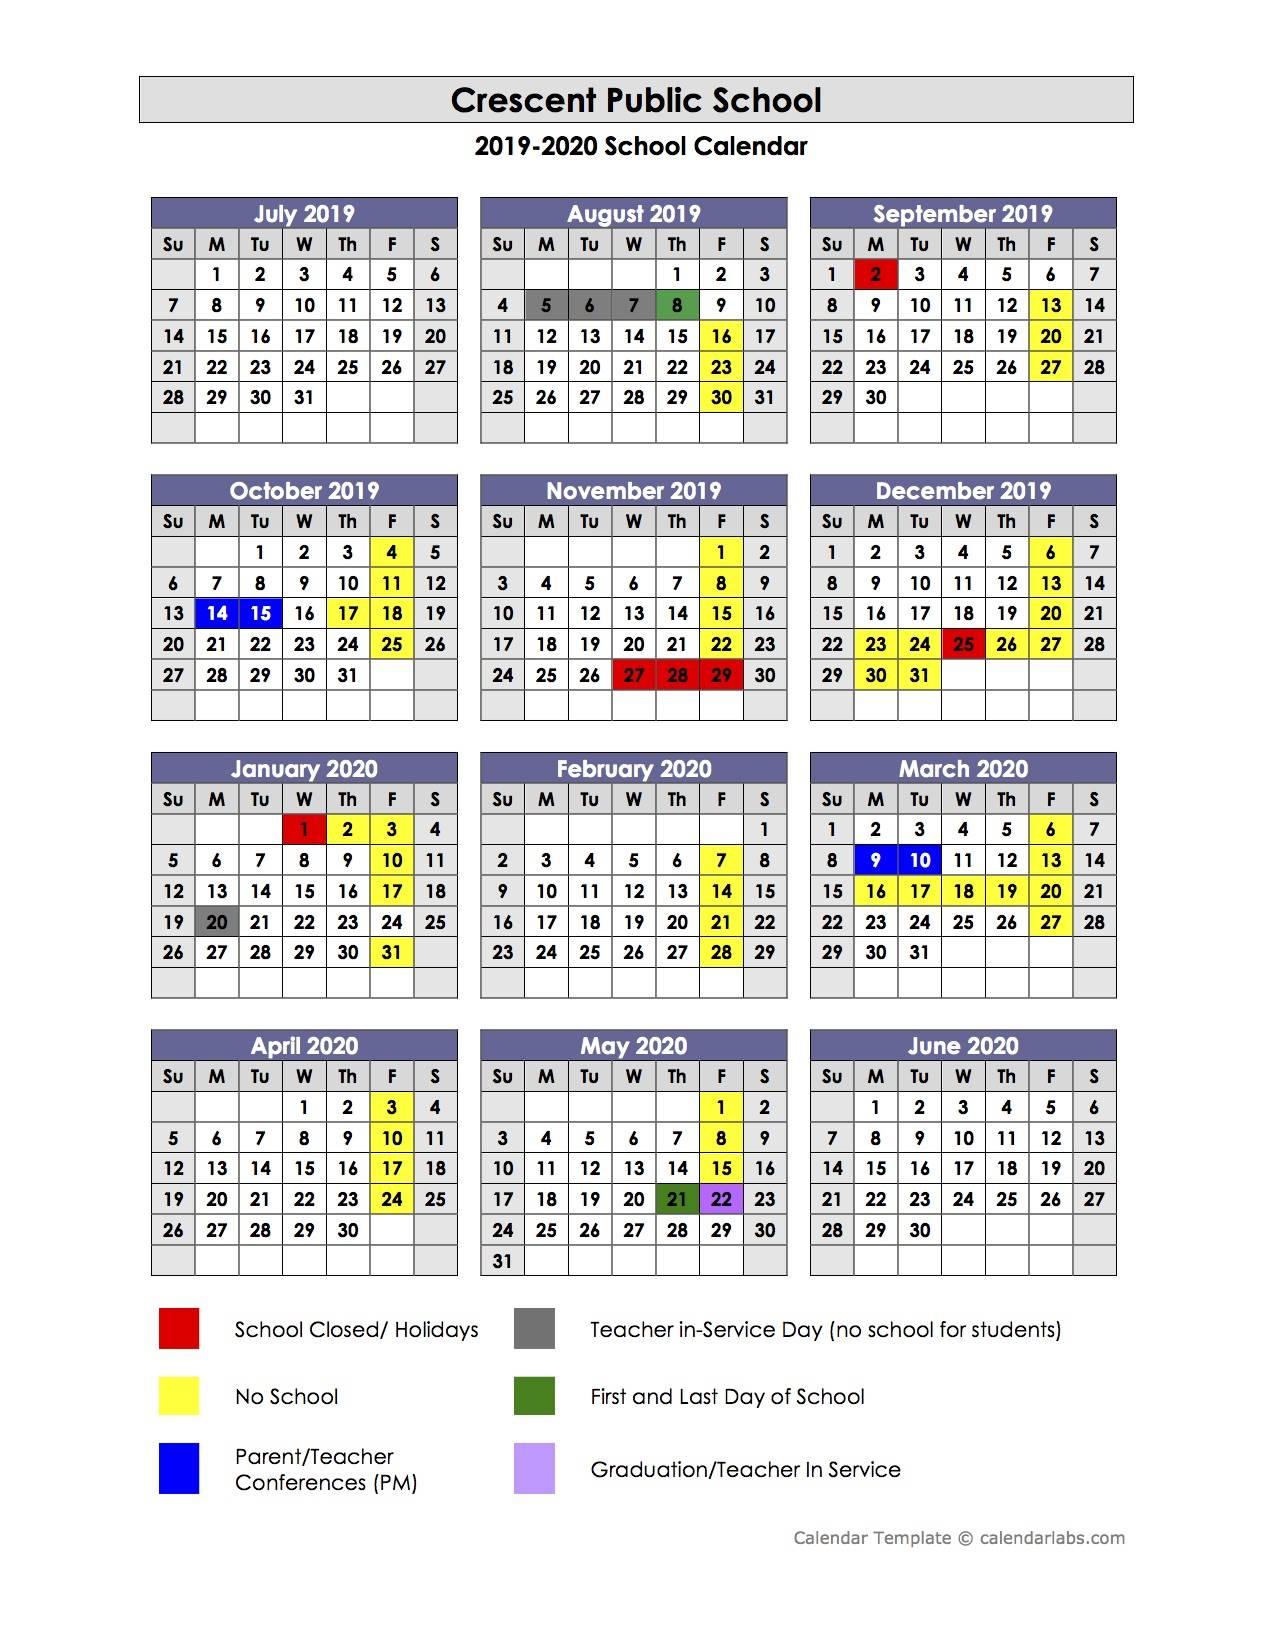 201920 District Calendar intended for Nicoma Park Middle School Calendar